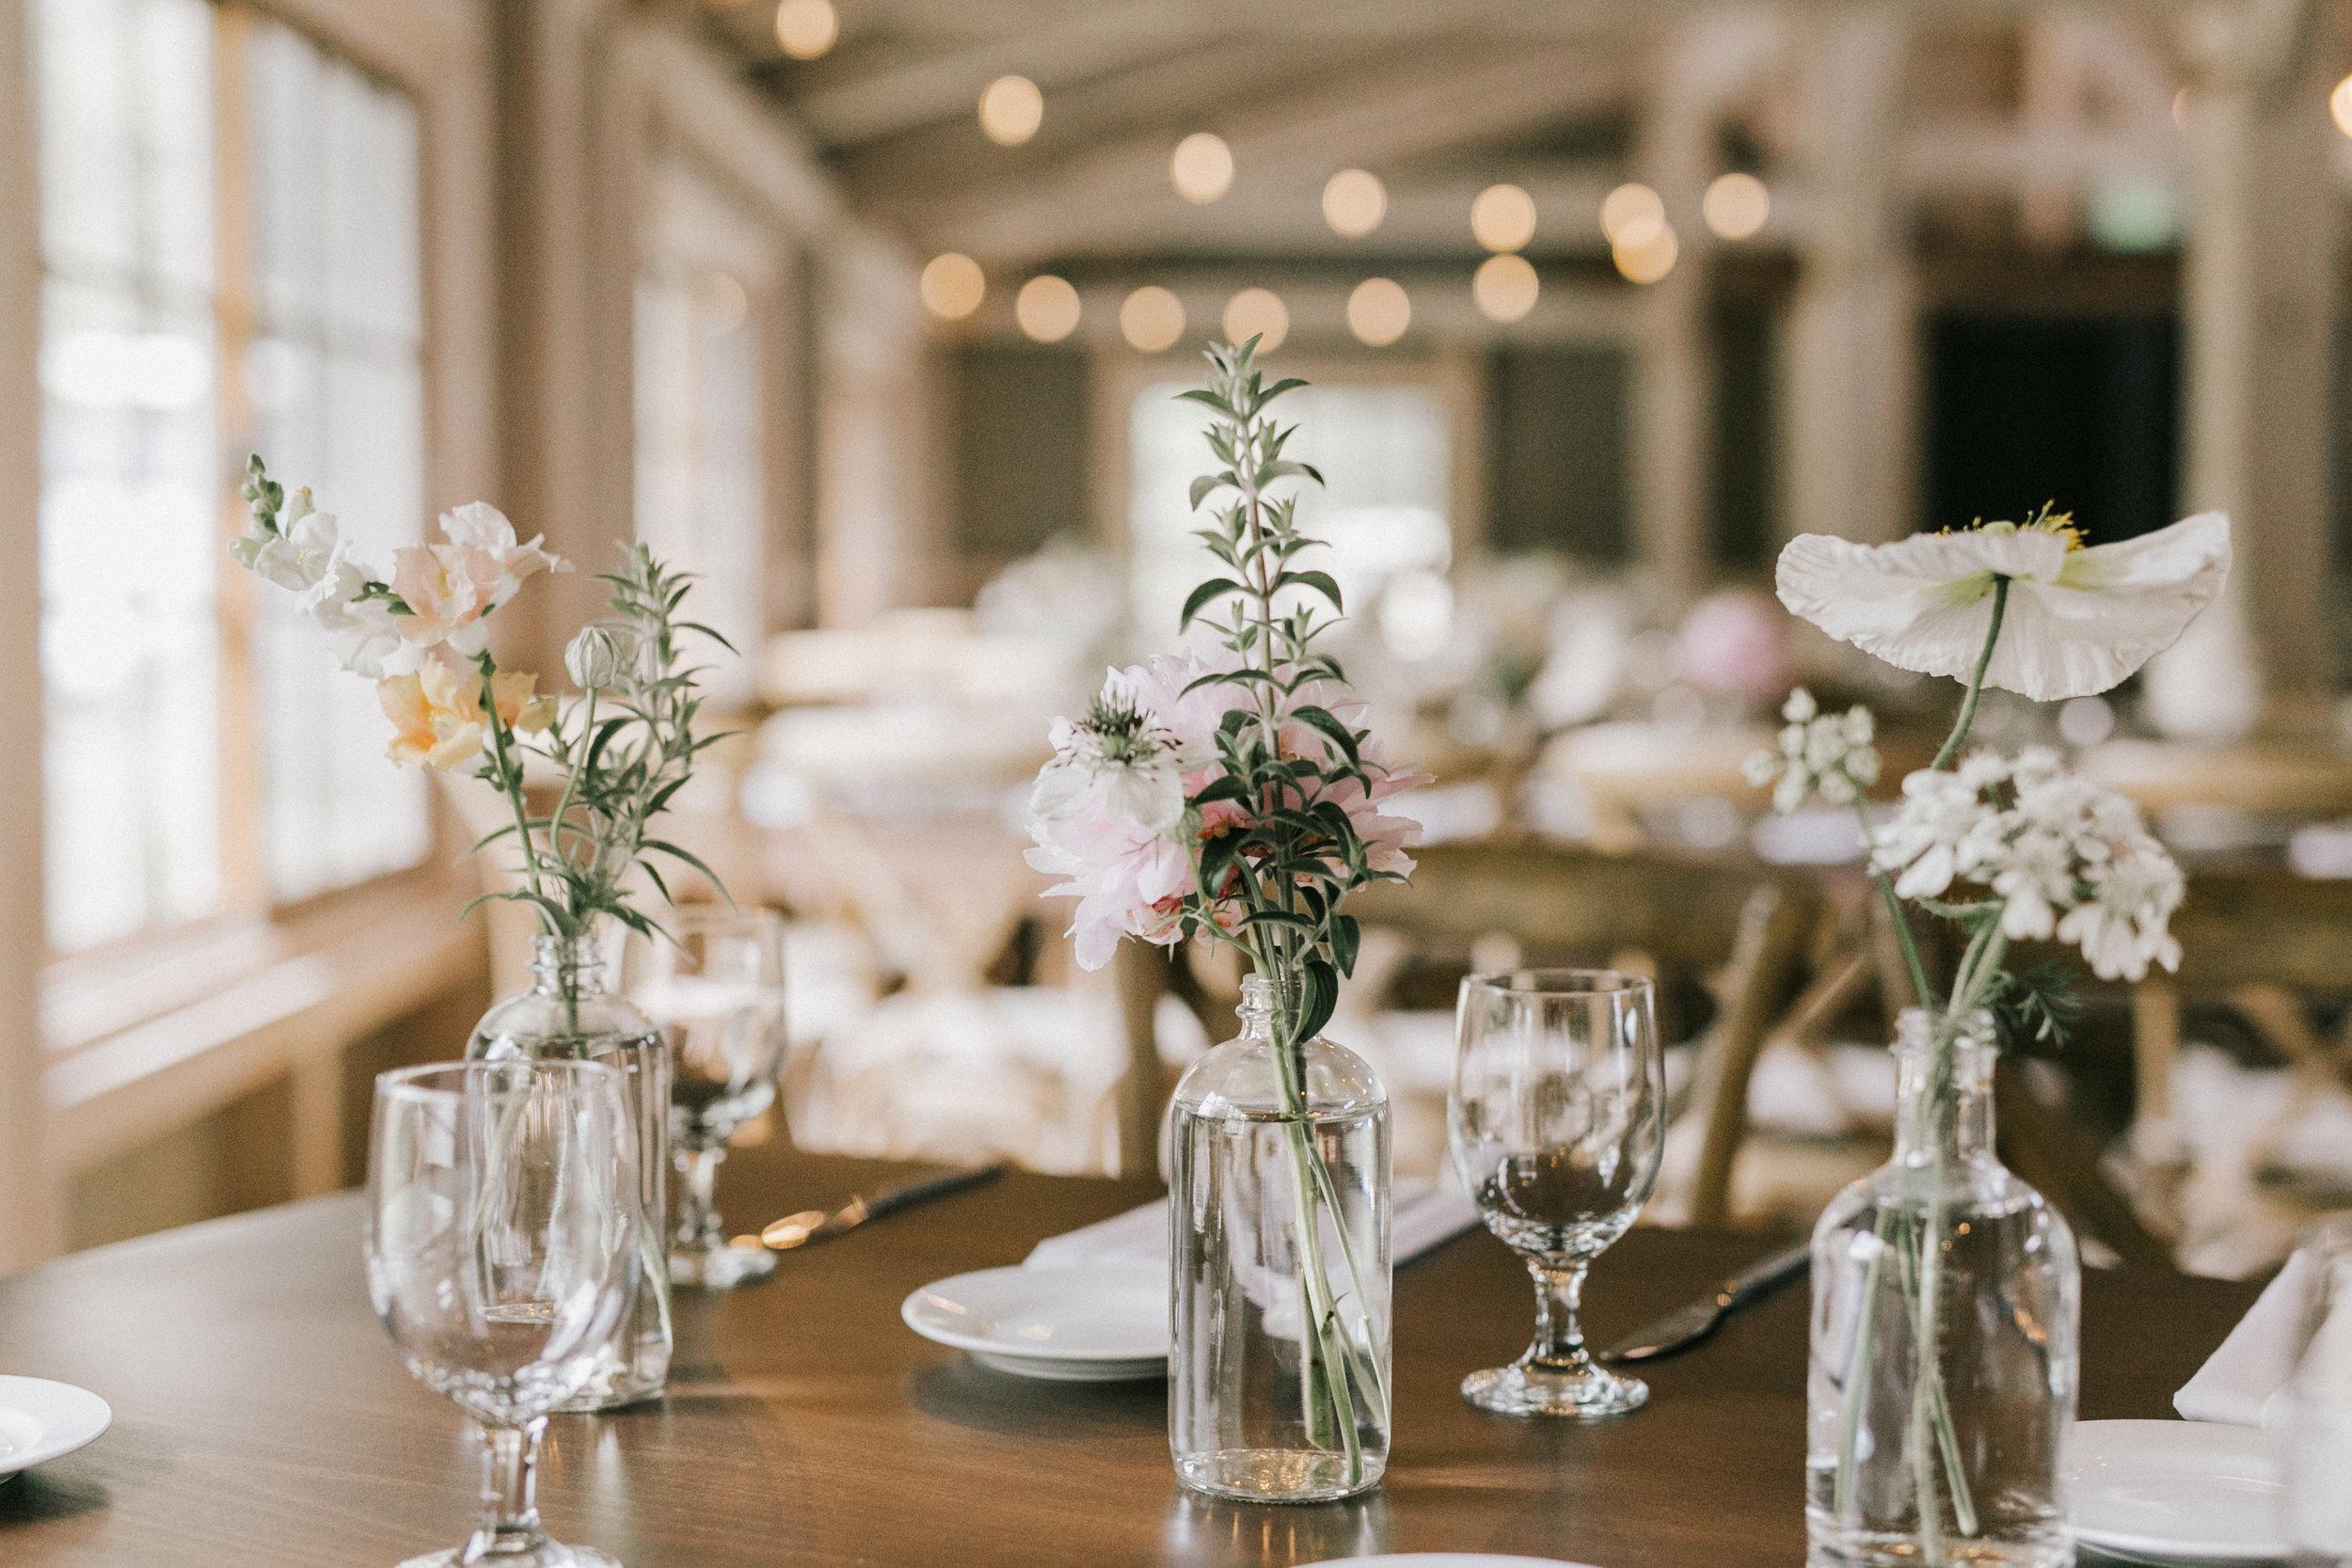 Watershed_Floral_Marianmade_Farm_Wedding_JamieMercurioPhoto2018-171.jpg